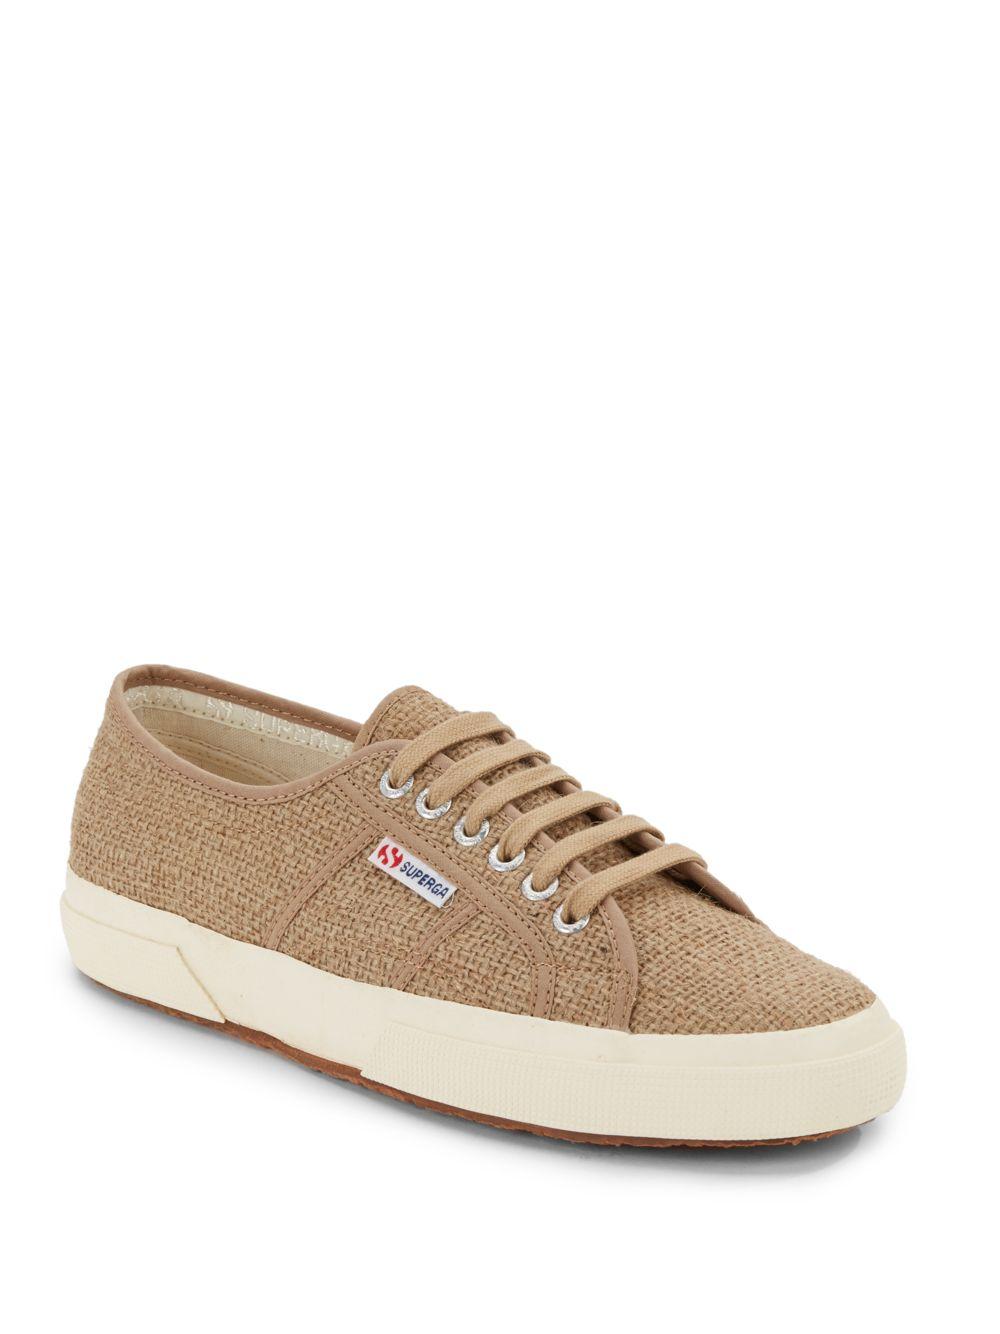 Superga Tennis Shoes